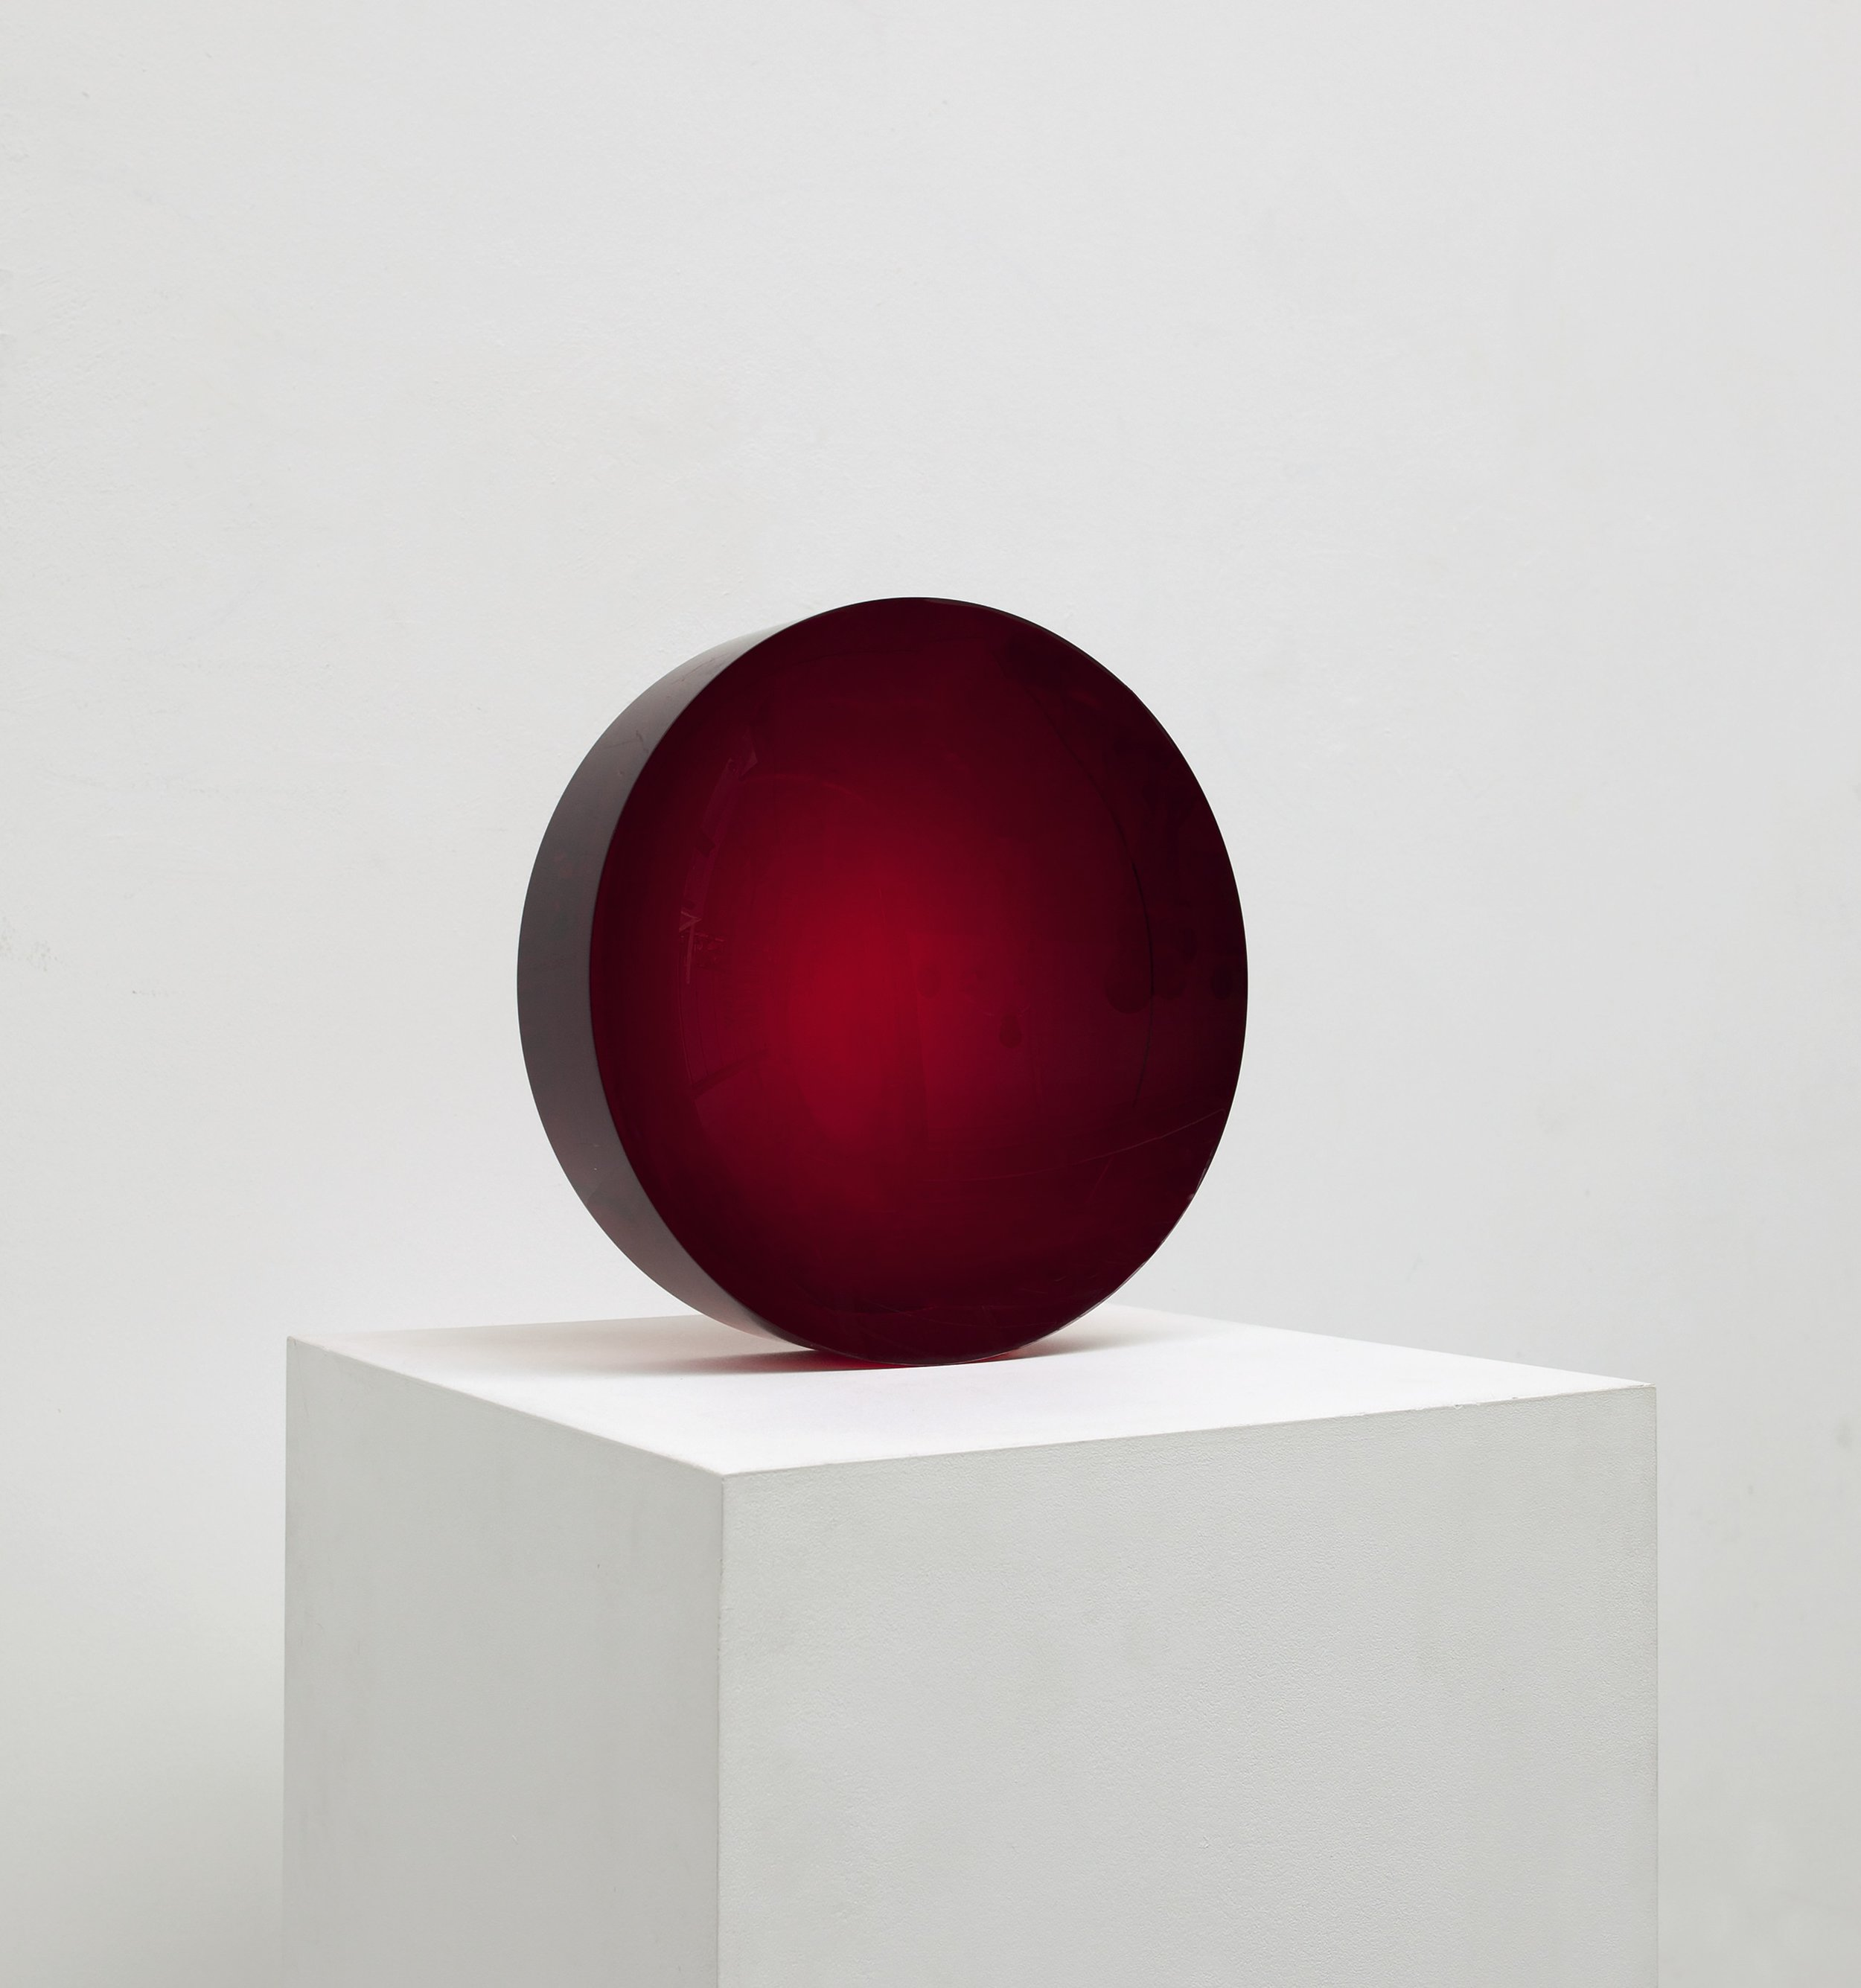 Unit 8: Anish Kapoor - Red Lens for Grenfell